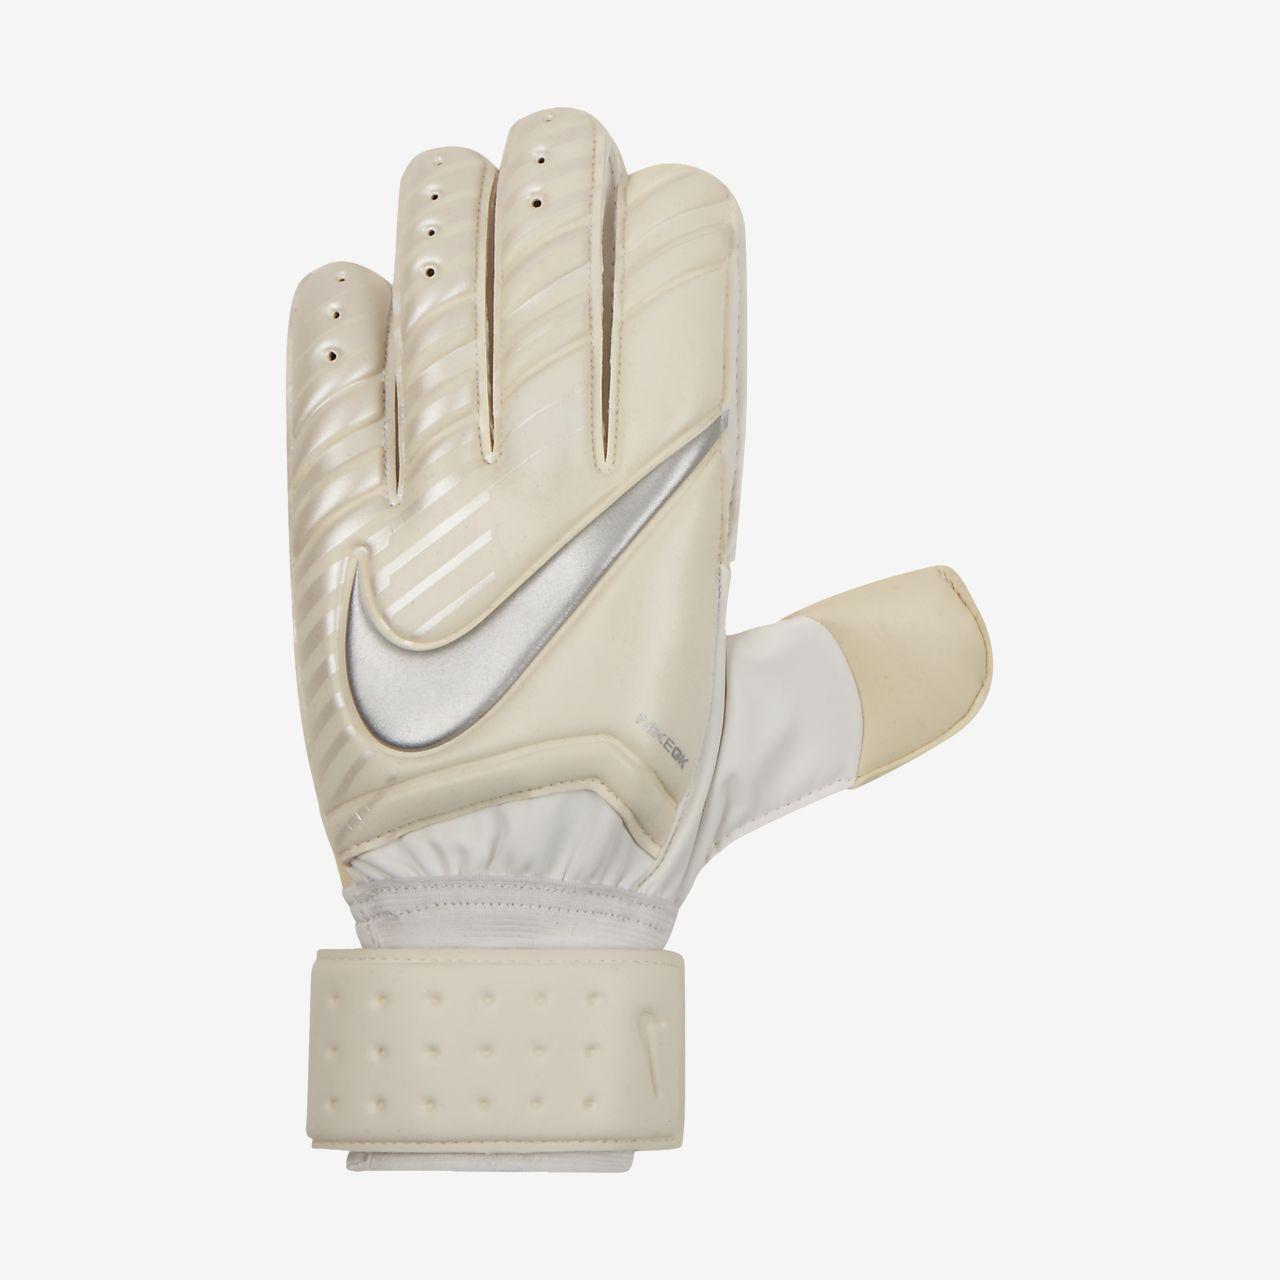 Nike Spyne Pro Goalkeeper Fußballhandschuhe